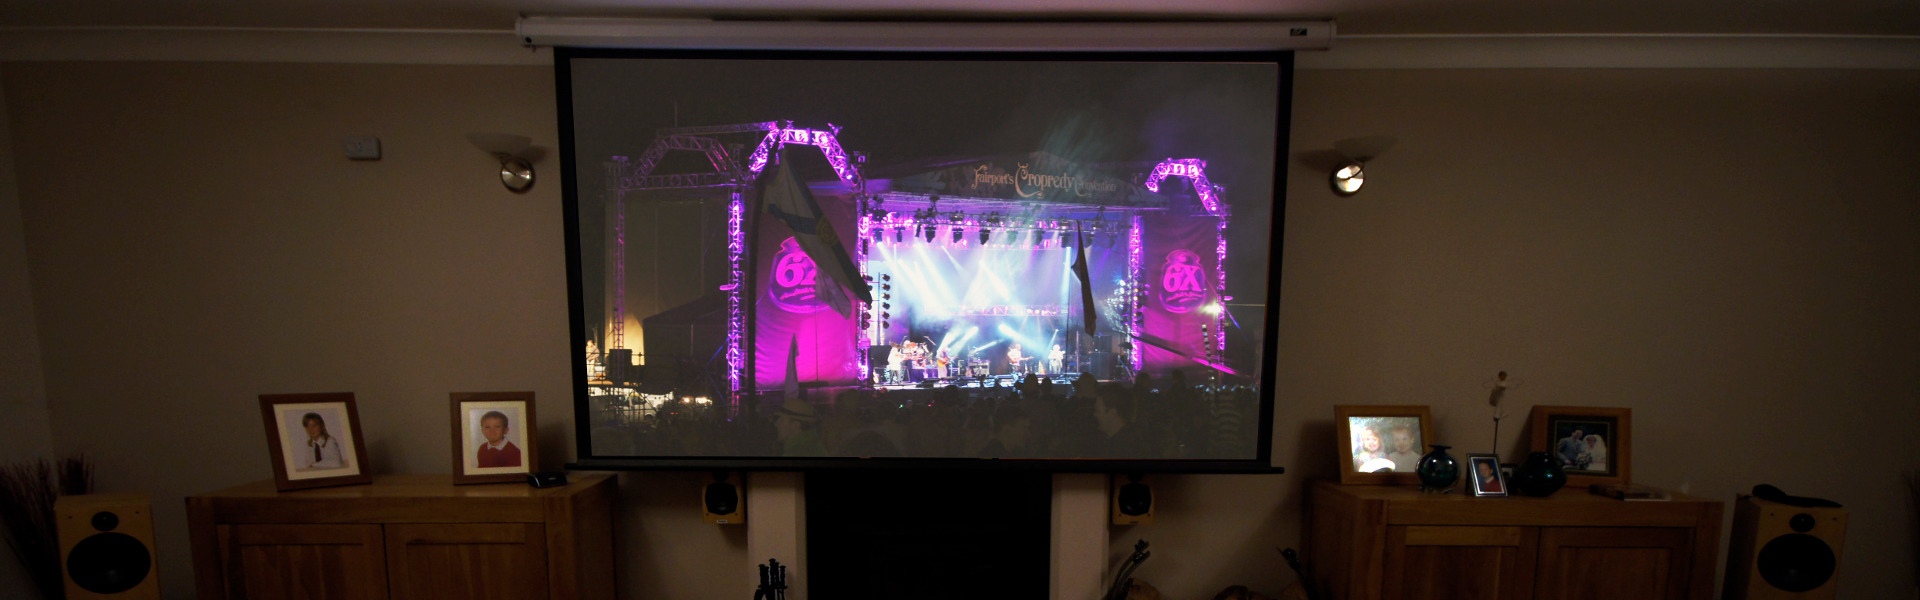 Head-on-Pj-screen-Live-music-stage1920X600